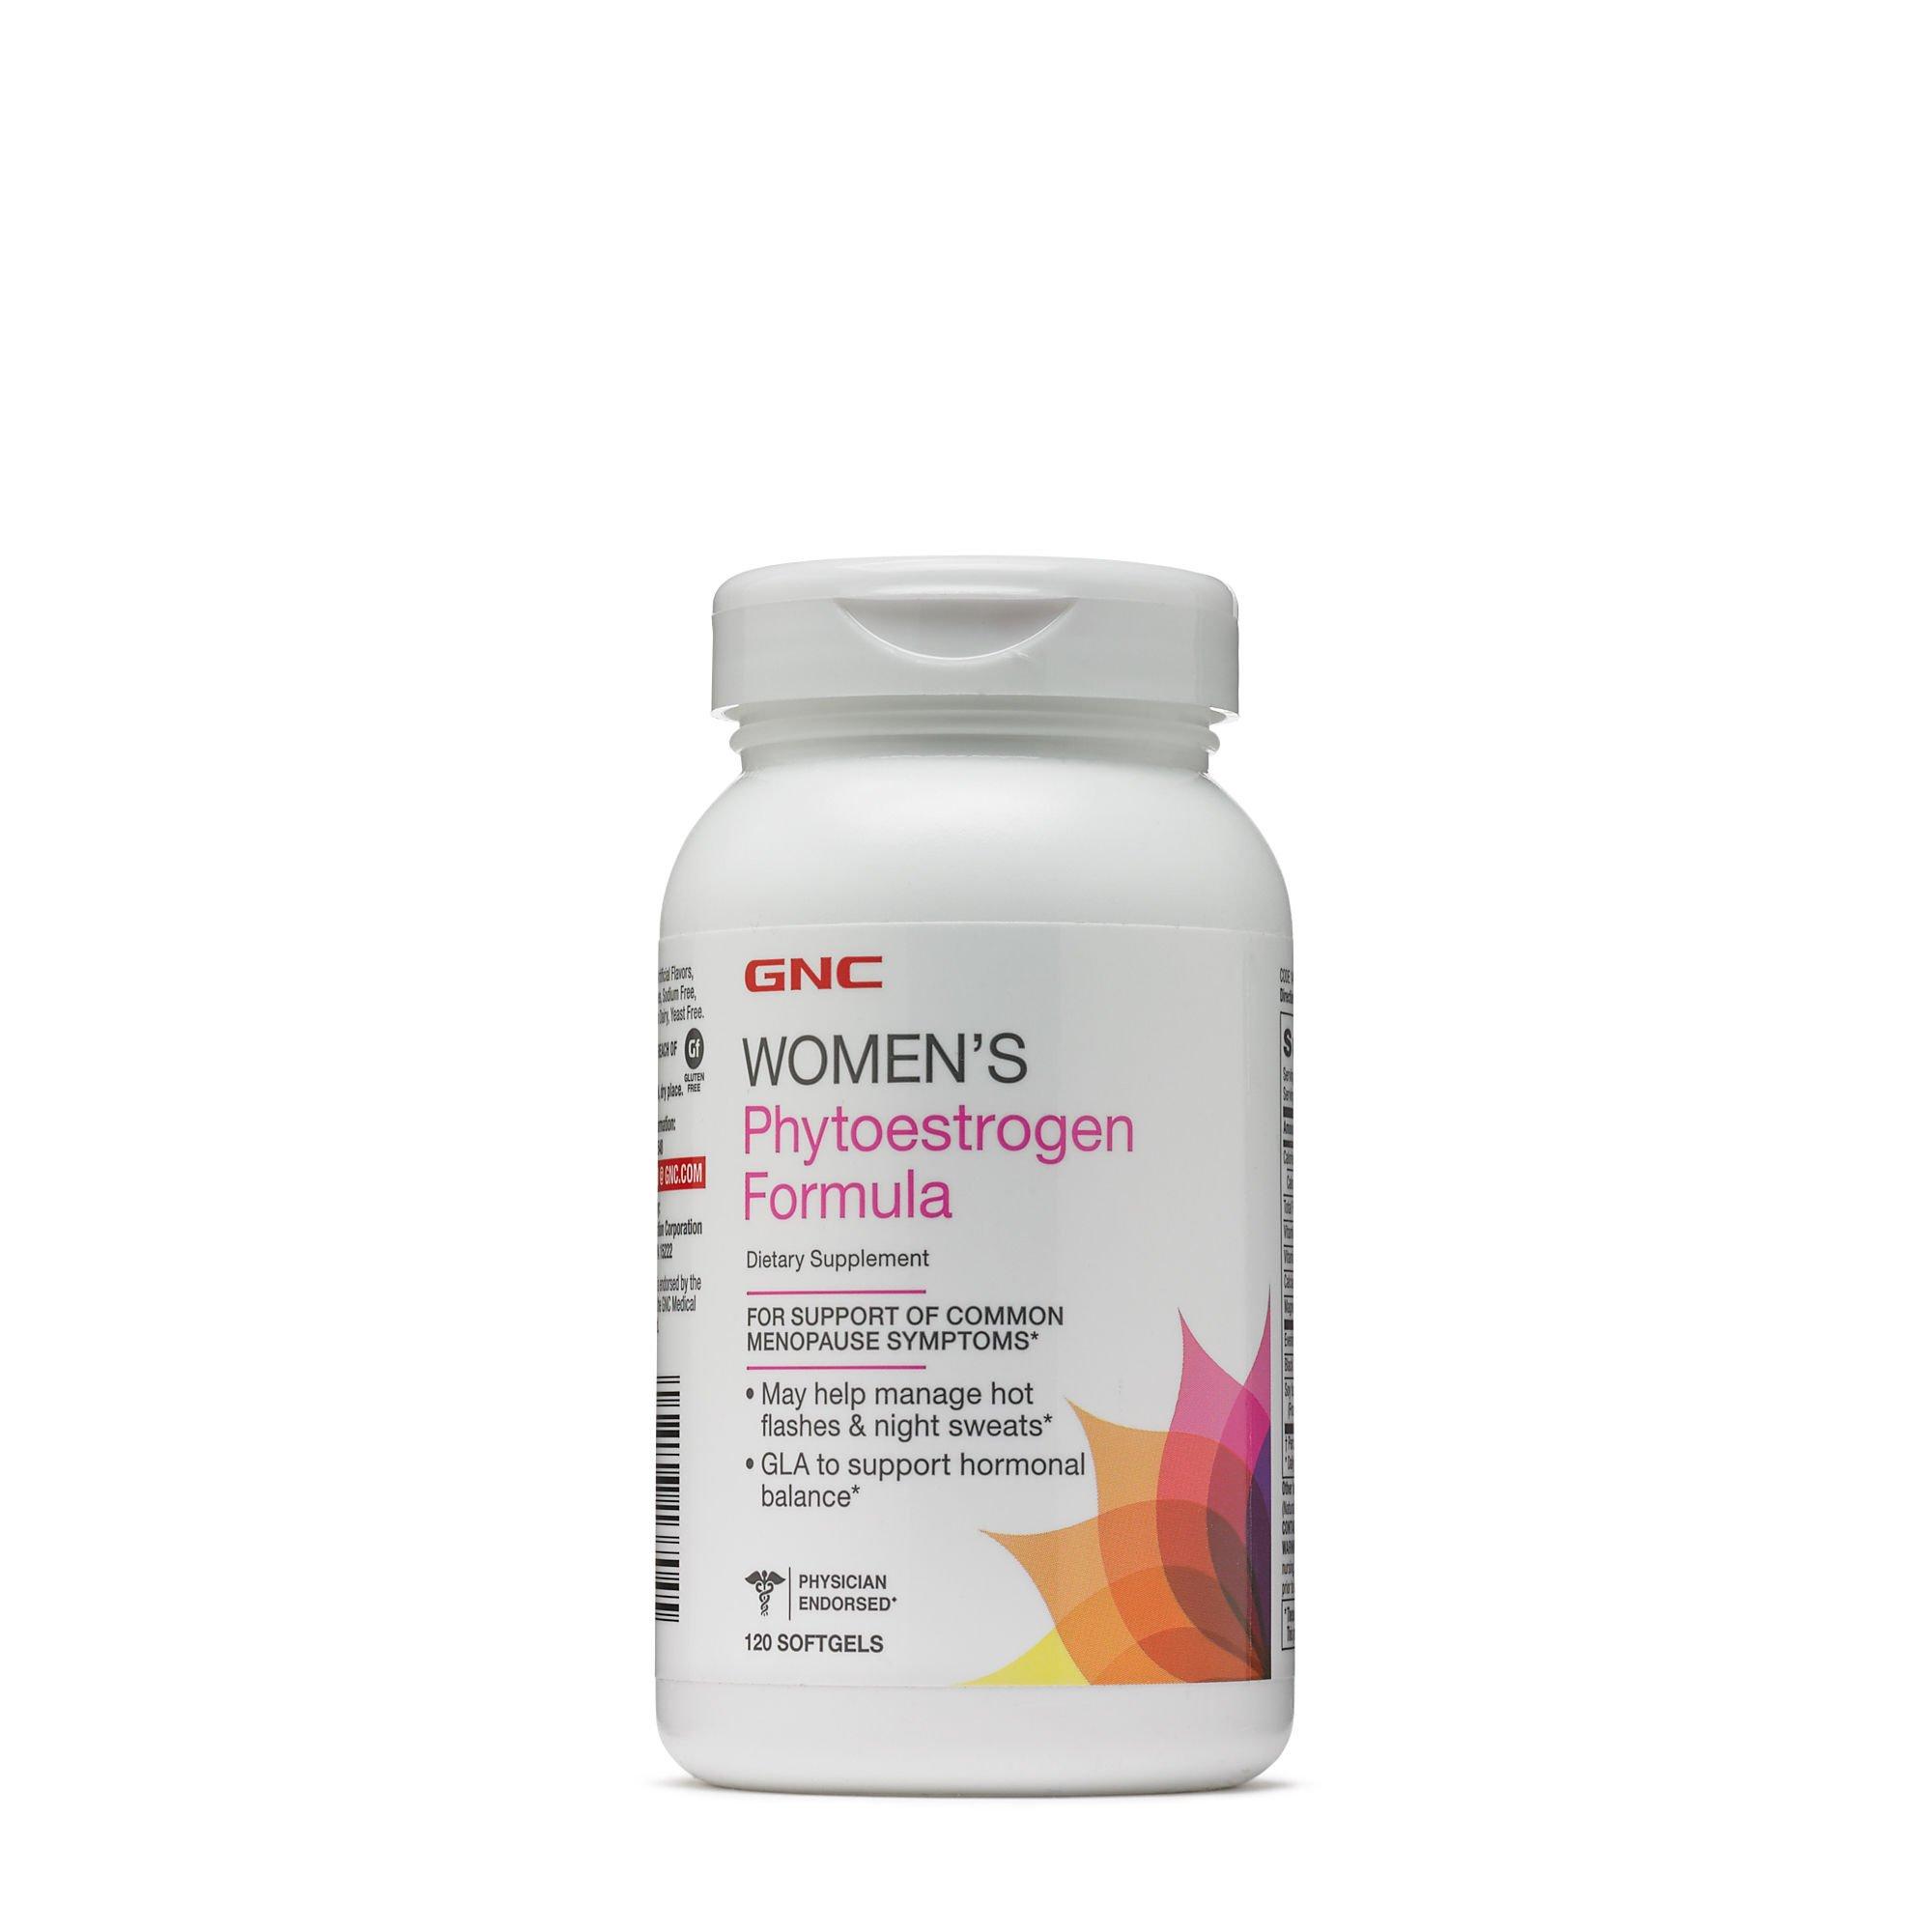 GNC Womens Phyto-Estrogen Formula for Common Menopause Symptom Relief - 120 Softgels